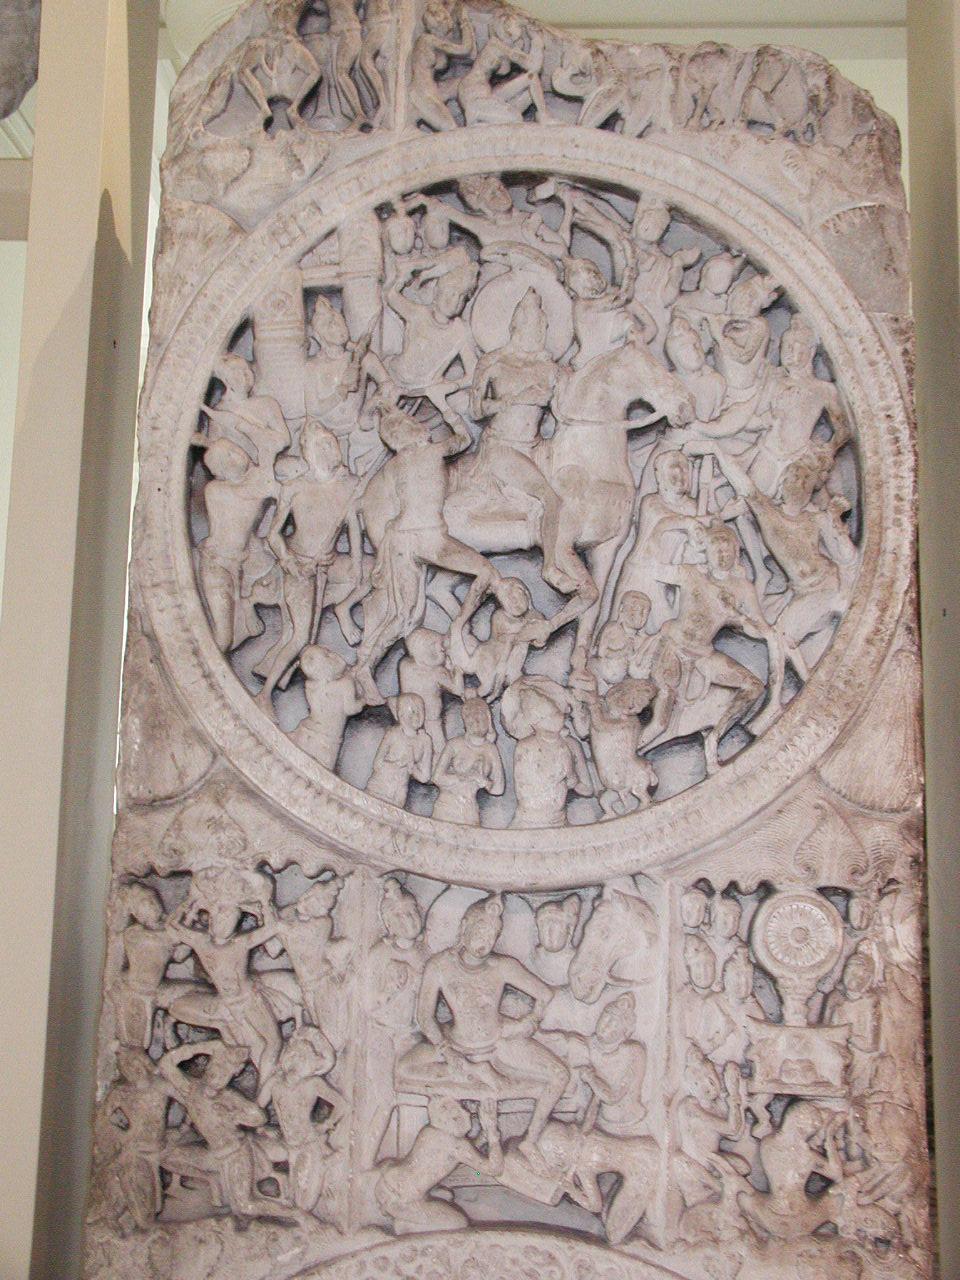 SMALL BUT INFORMATIVE - Review of Amaravati Museum ...